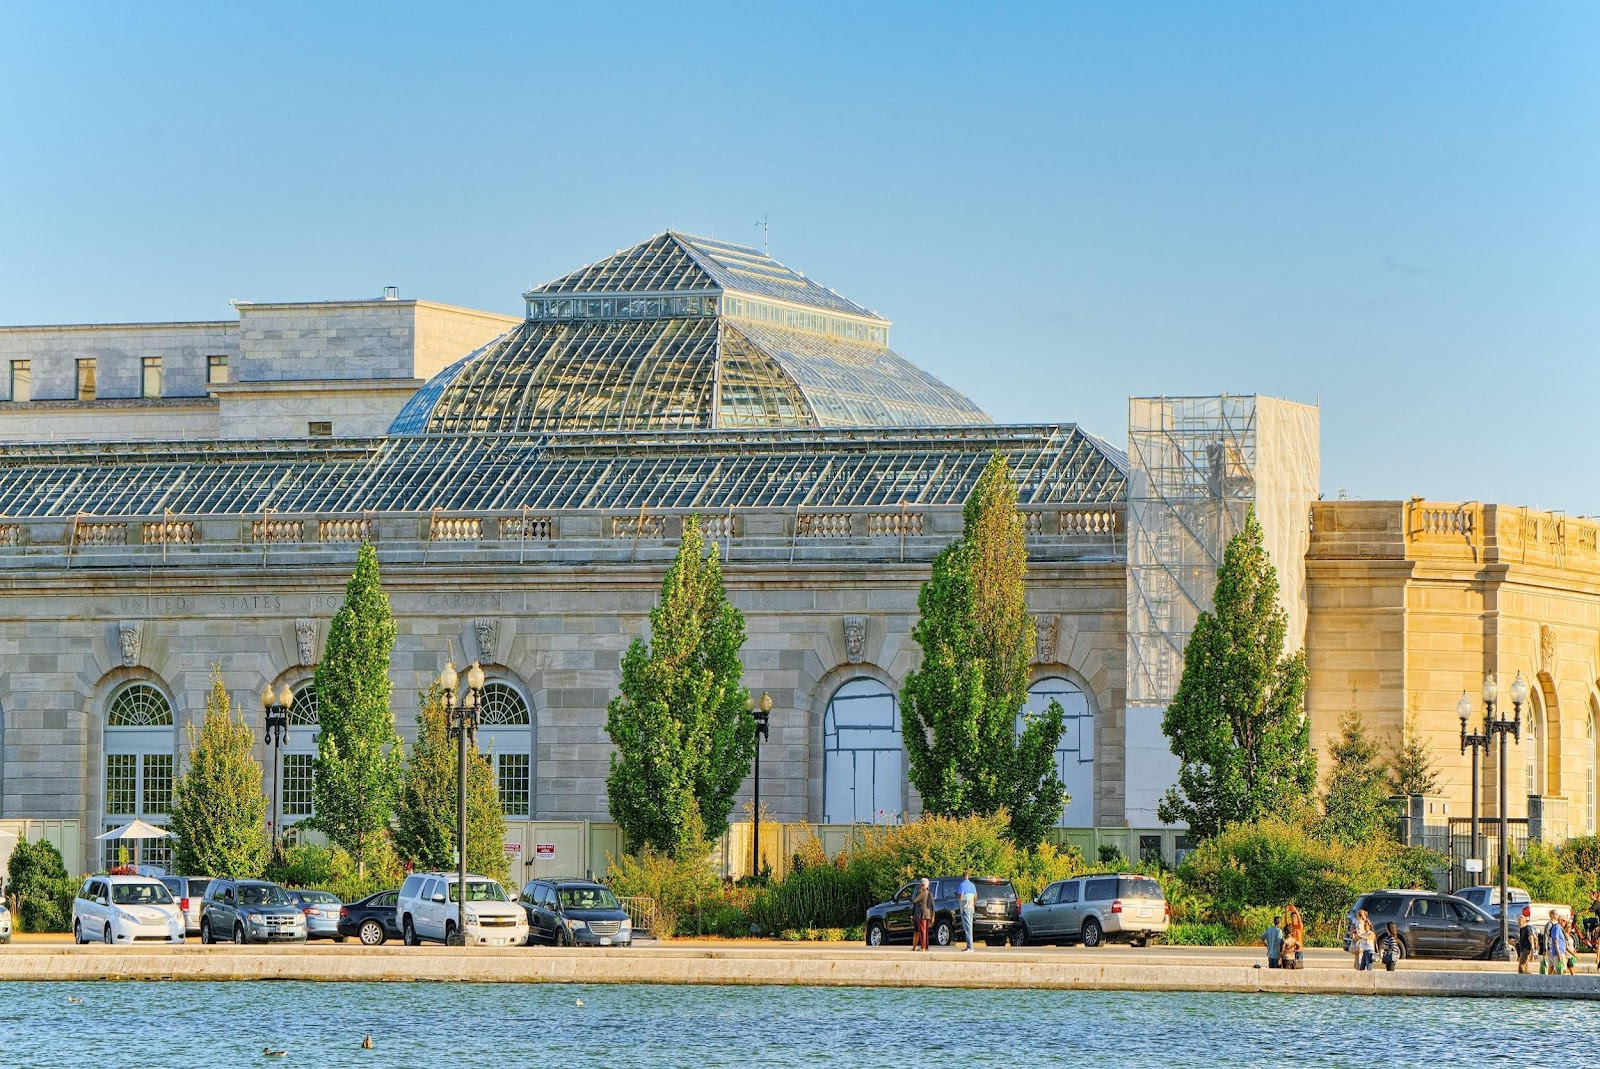 United States Botanic Garden Washington, D.C. museums for kids